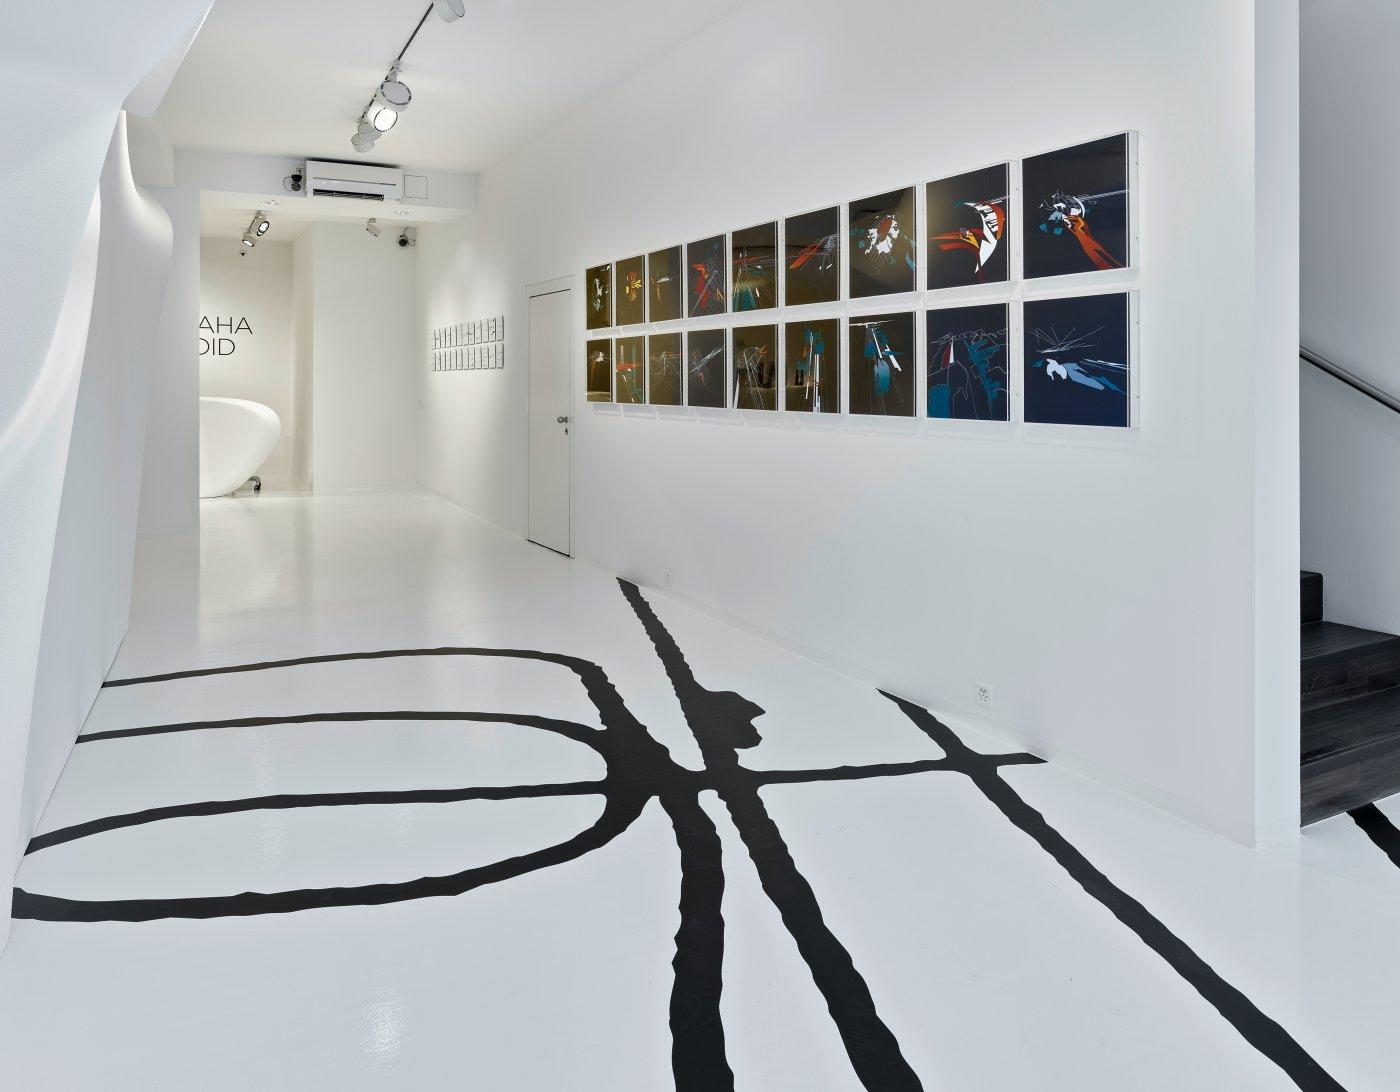 Galerie Gmurzynska Paradeplatz Zaha Hadid 4